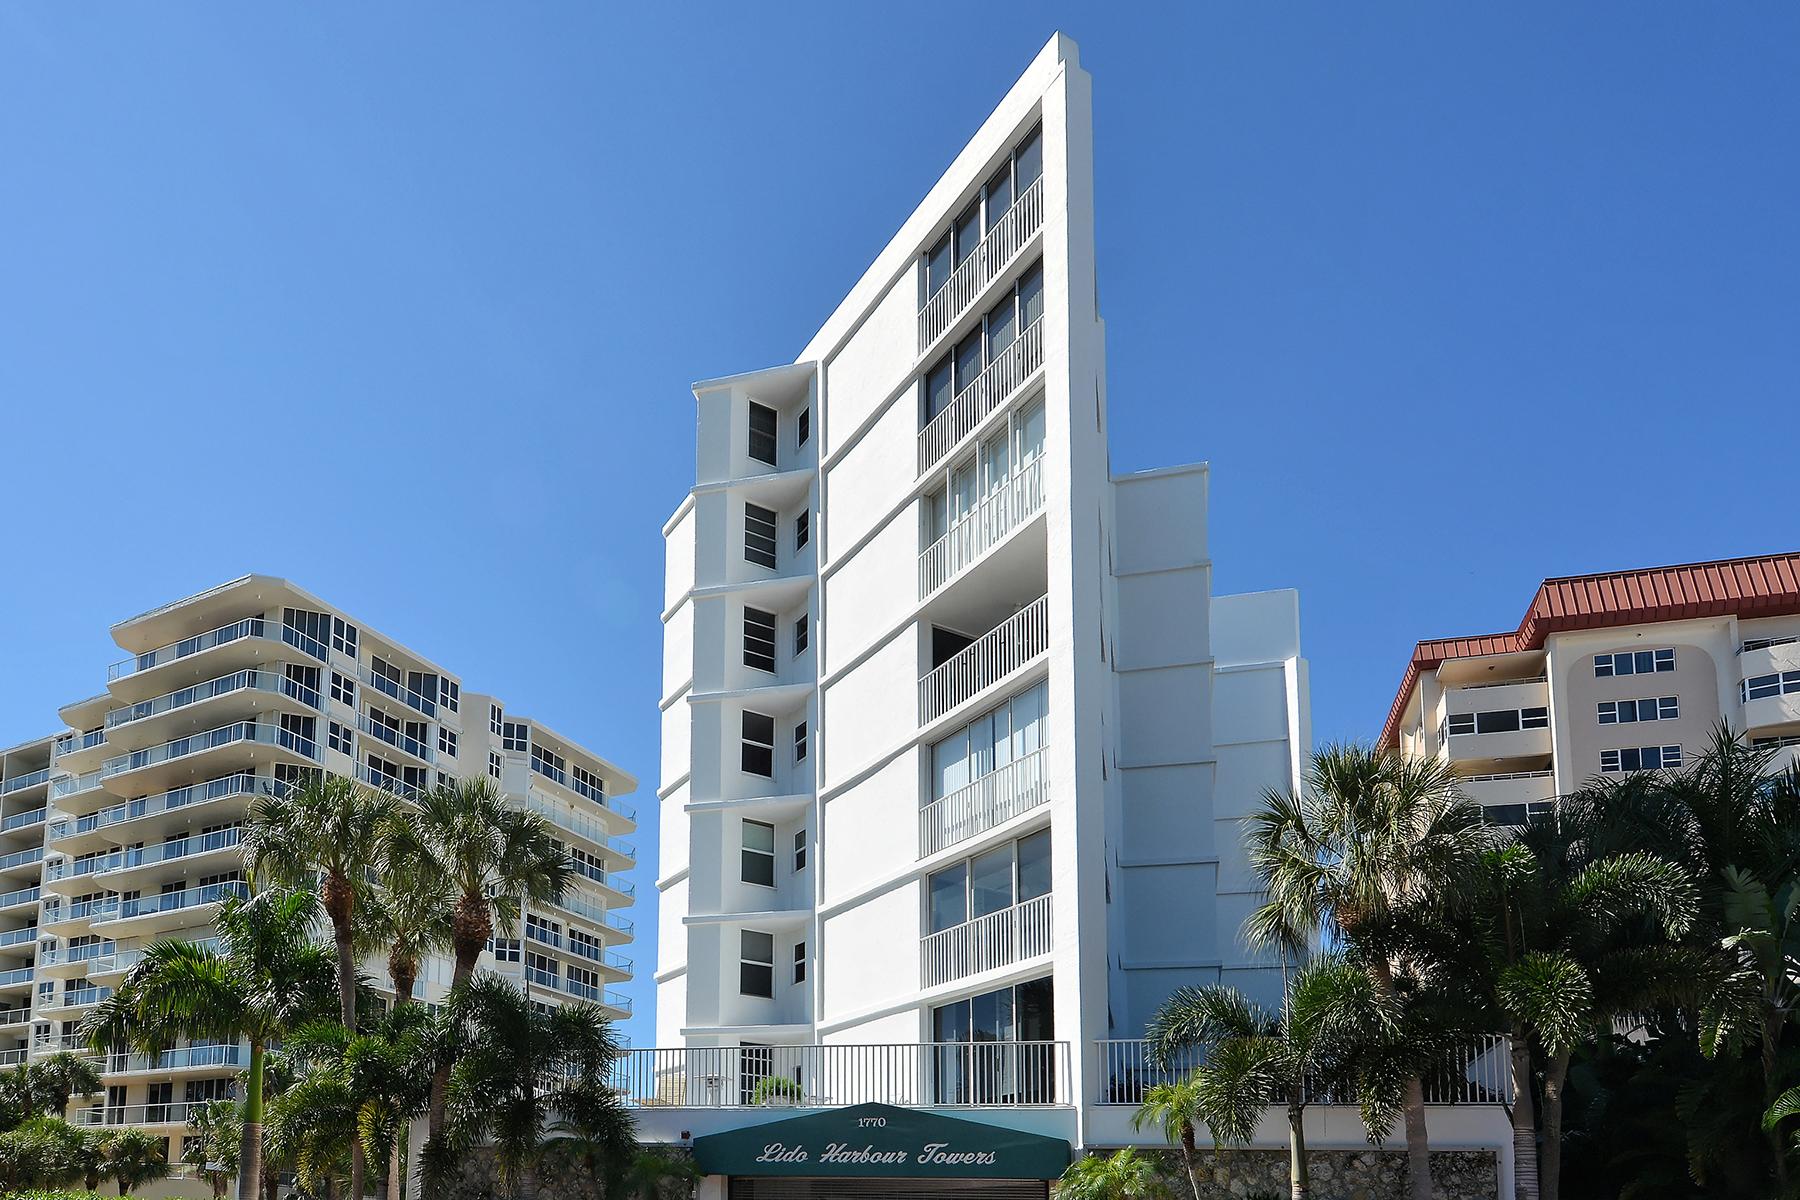 Condomínio para Venda às SARASOTA 1770 Benjamin Franklin Dr 407 Sarasota, Florida, 34236 Estados Unidos